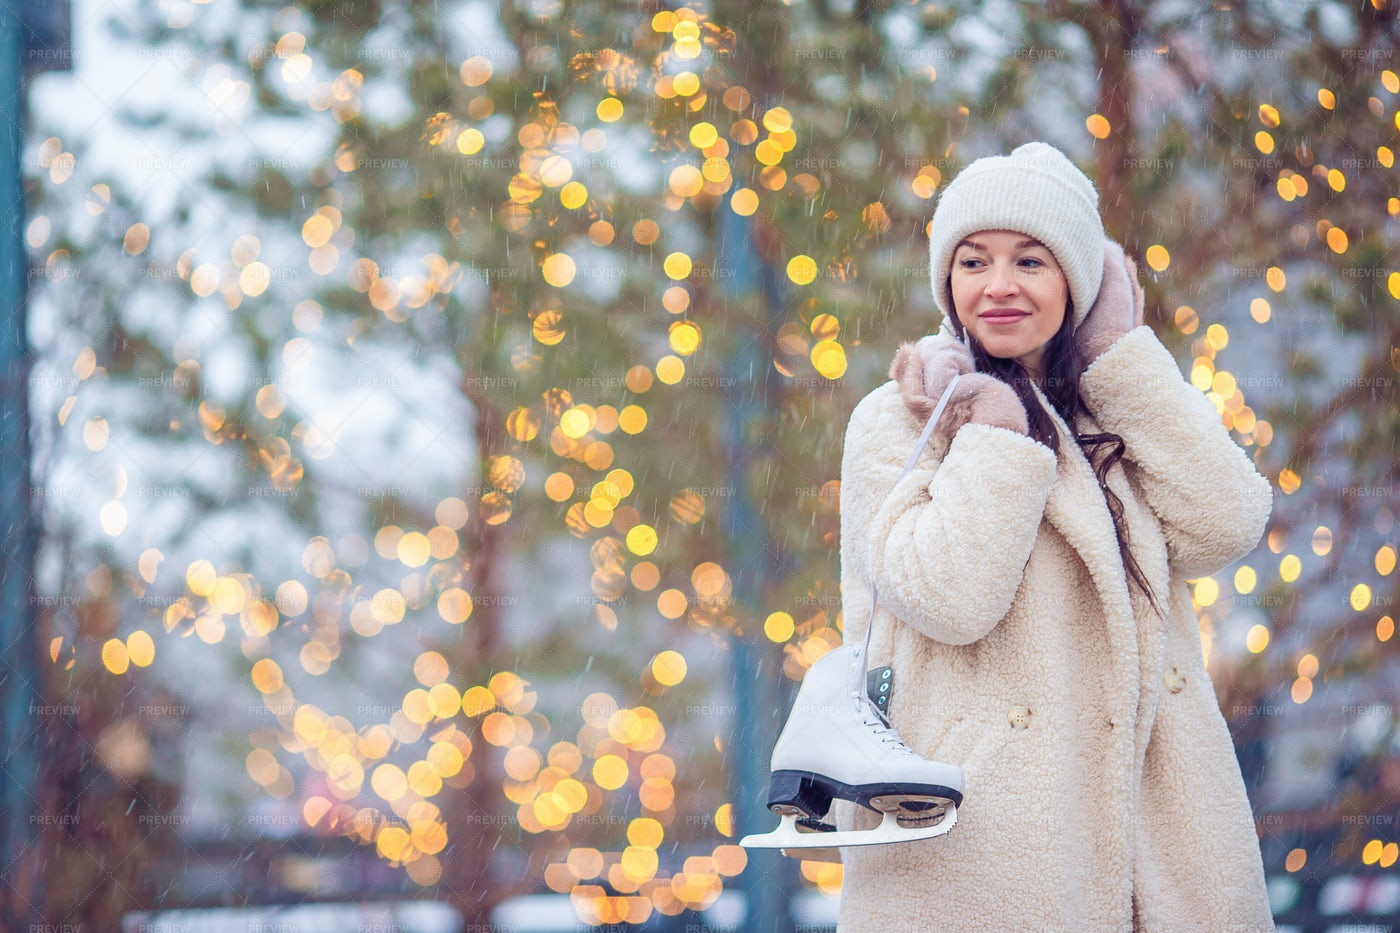 Woman With Ice Skates Outside: Stock Photos